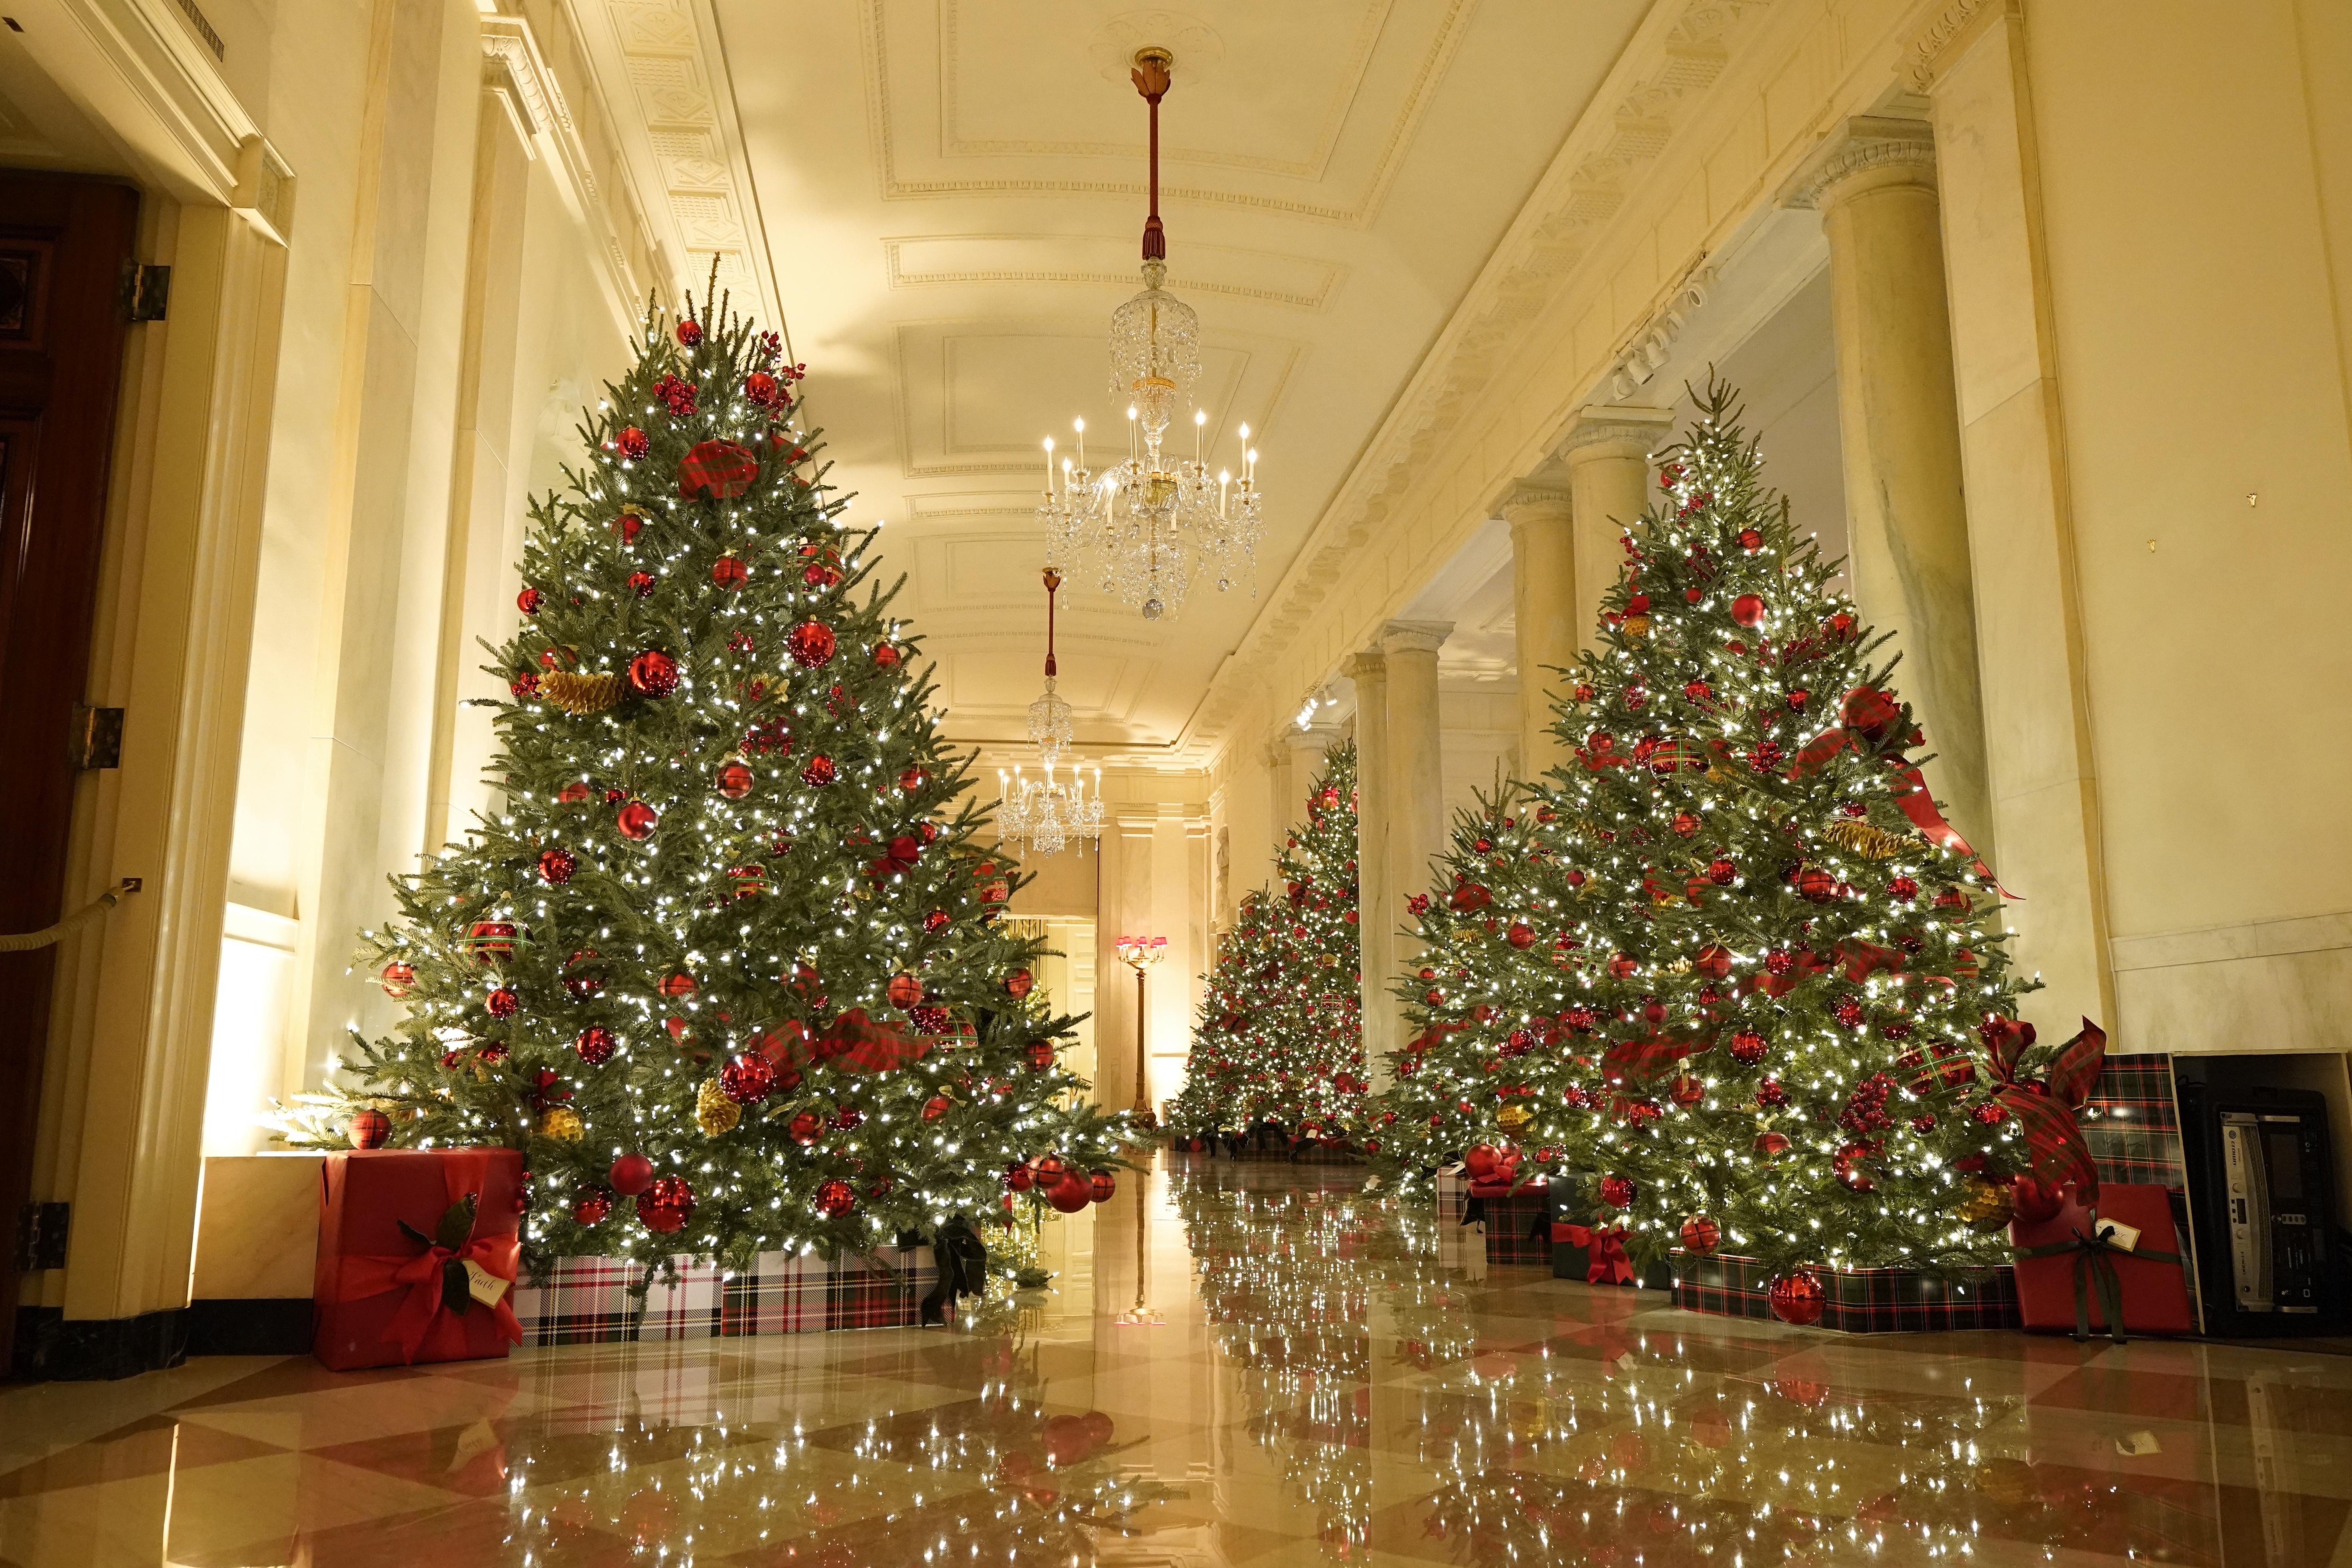 Whitehouse Christmas Decor 2021 Melania Trump Unveils White House Christmas Decorations With America The Beautiful Theme Mlive Com